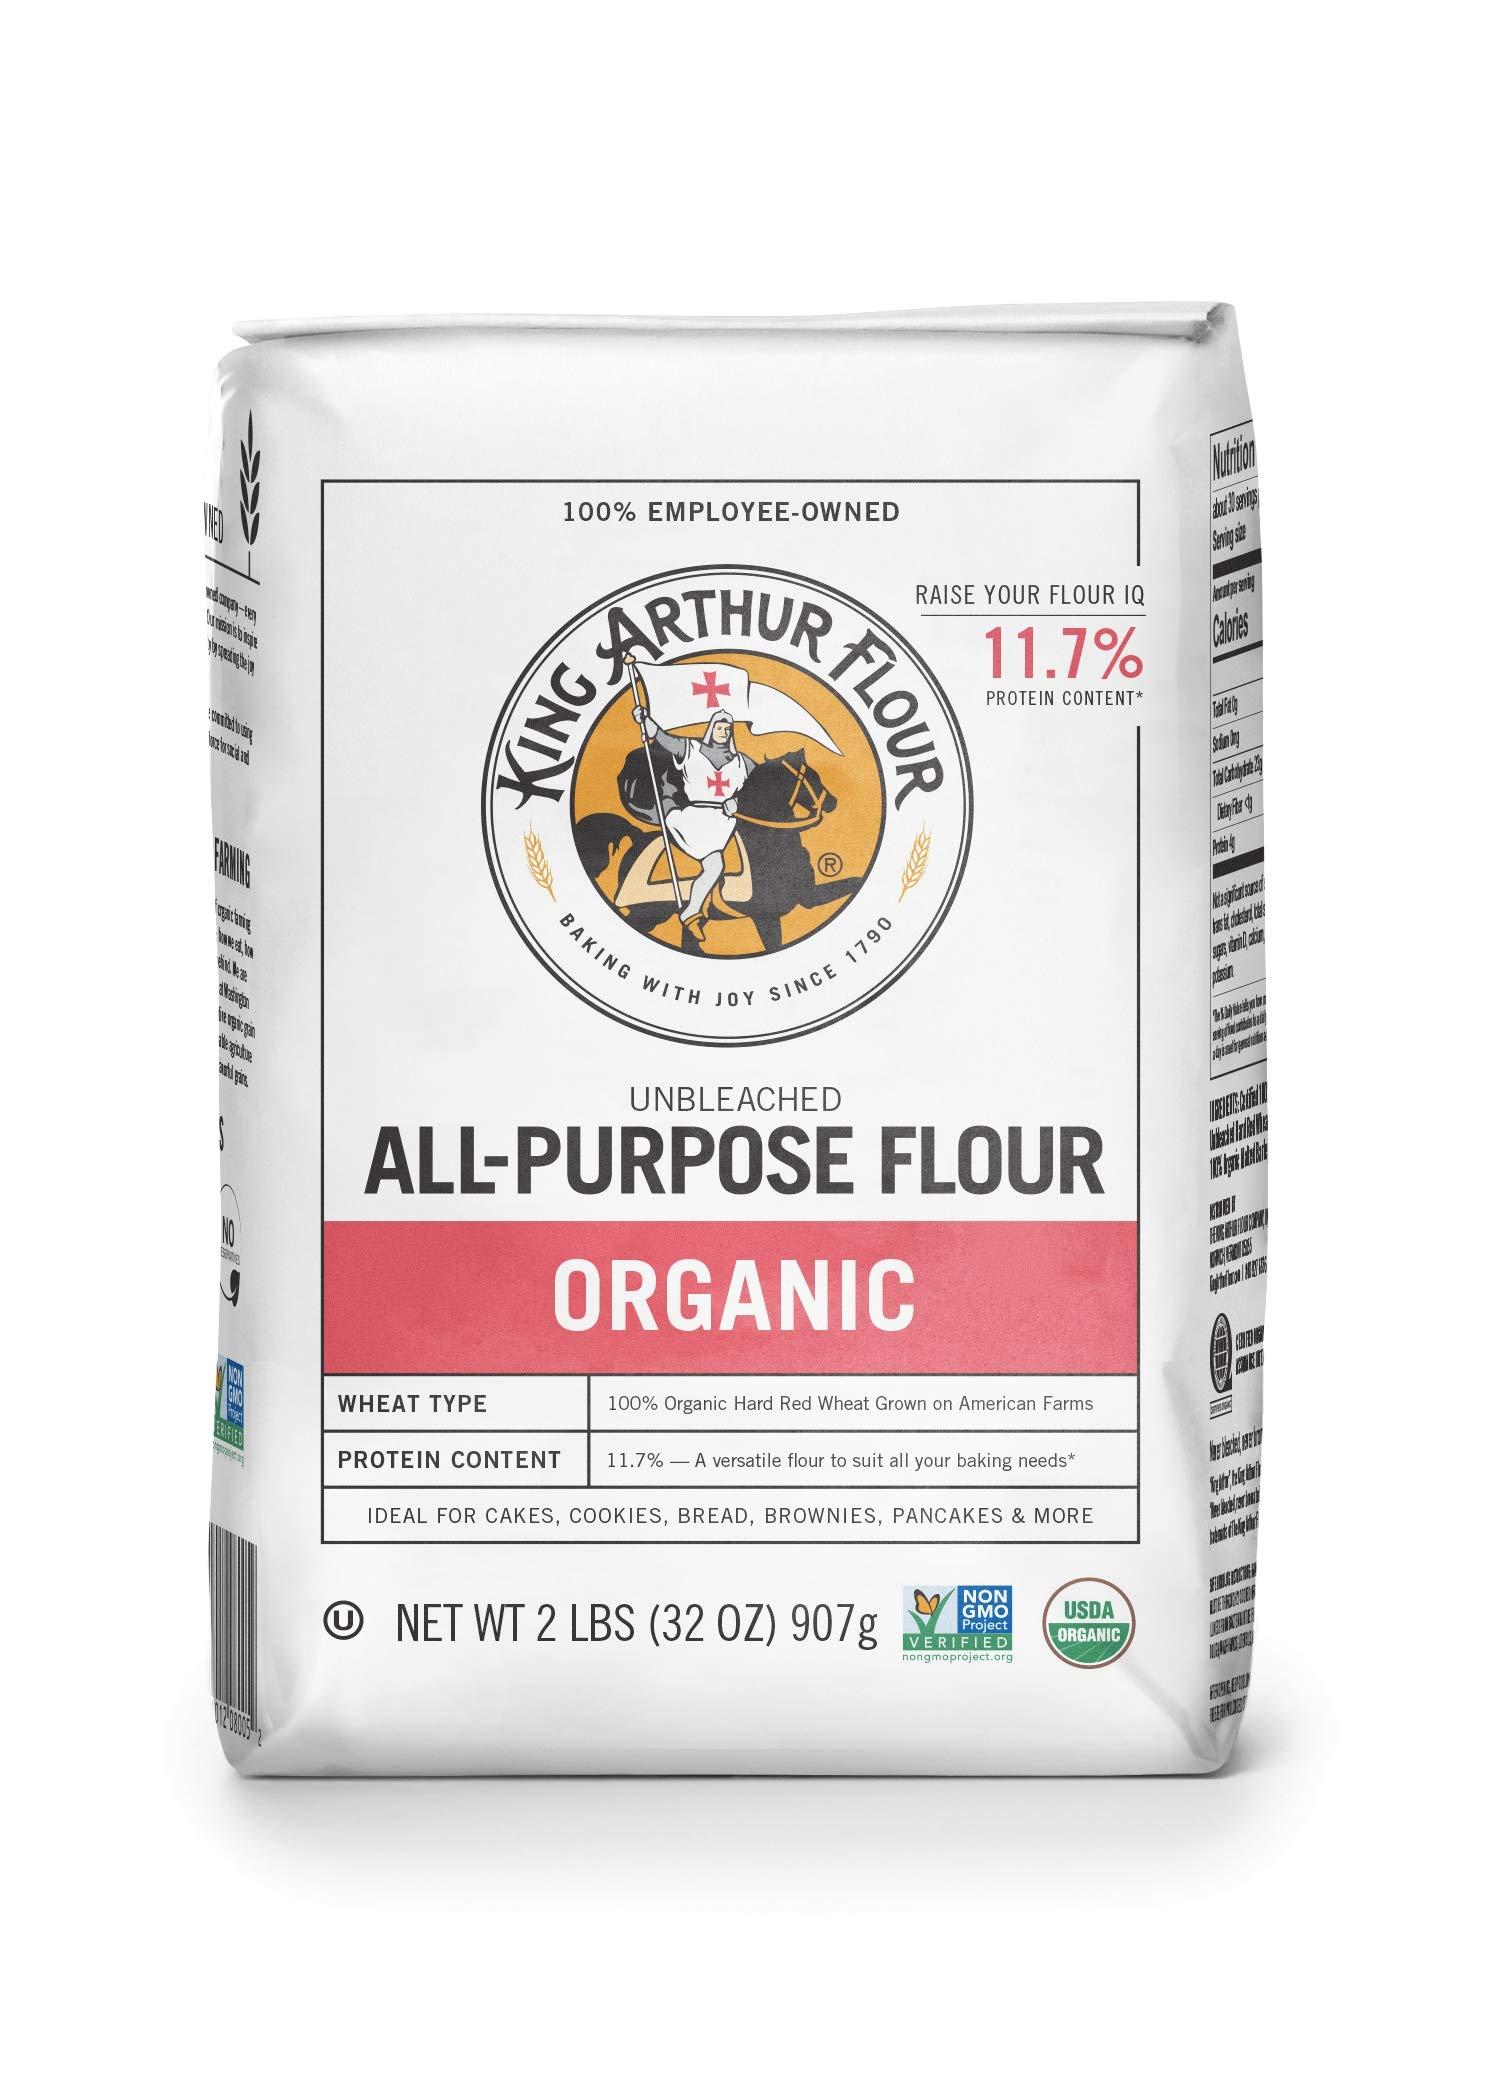 King Arthur Flour 100% Organic All-Purpose Flour, Unbleached, 2 Pound (Pack of 12) by King Arthur Flour (Image #1)